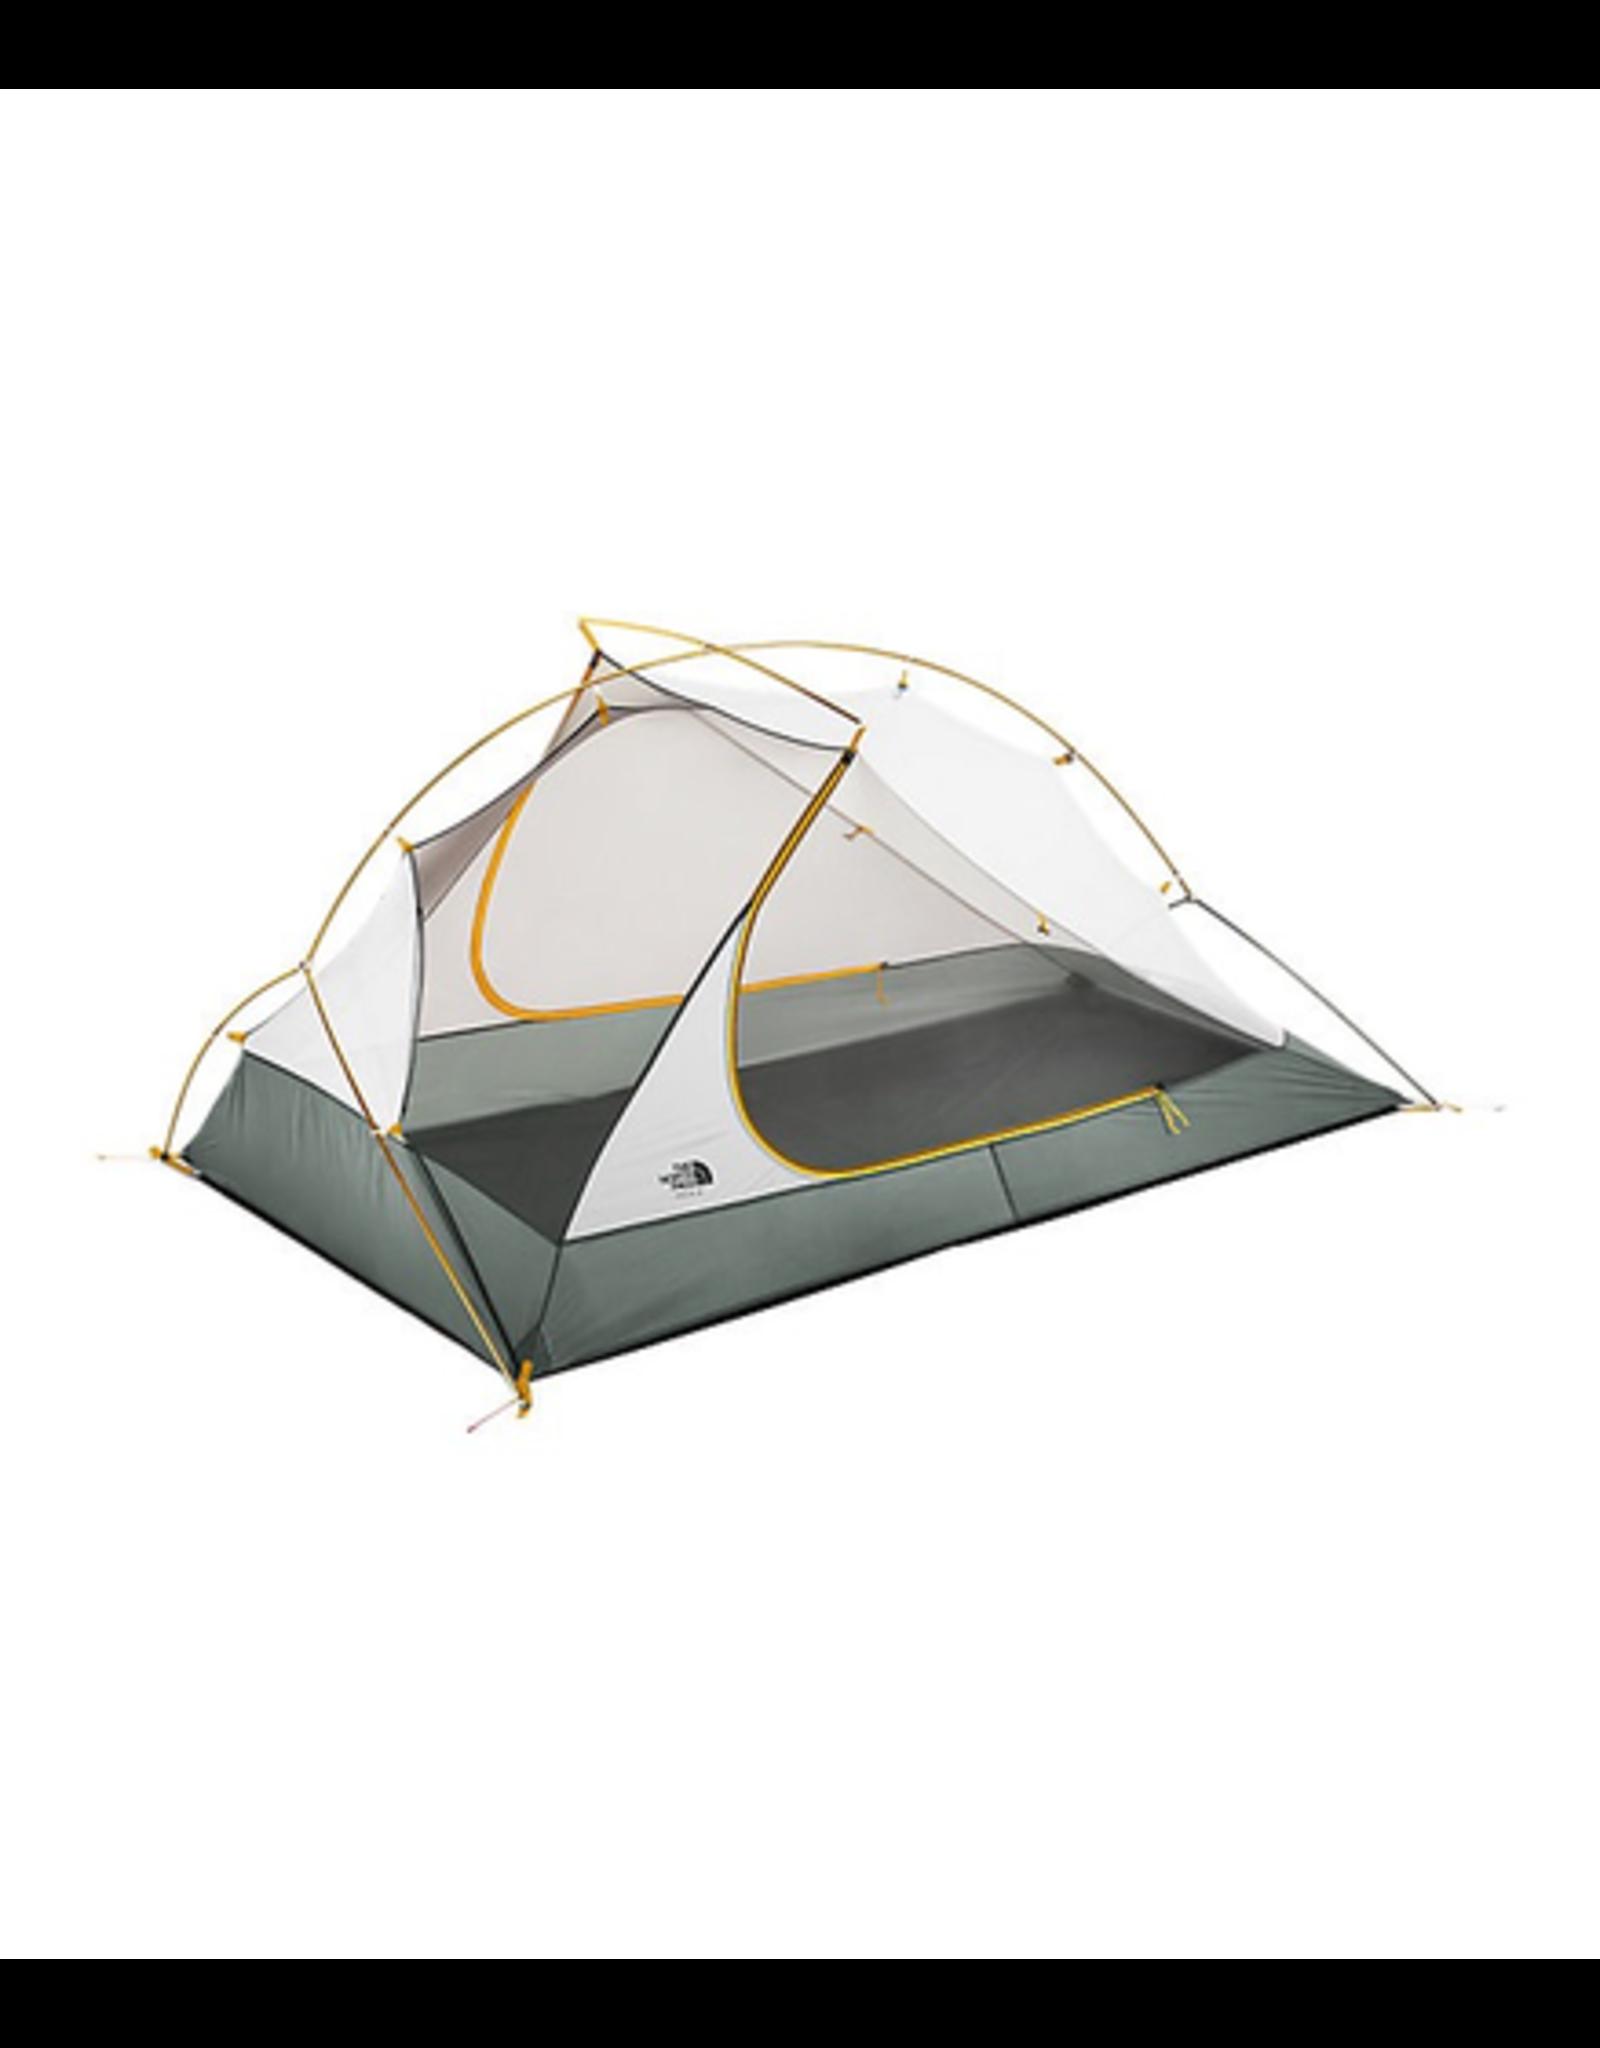 North Face North Face Mica FL 2 Tent